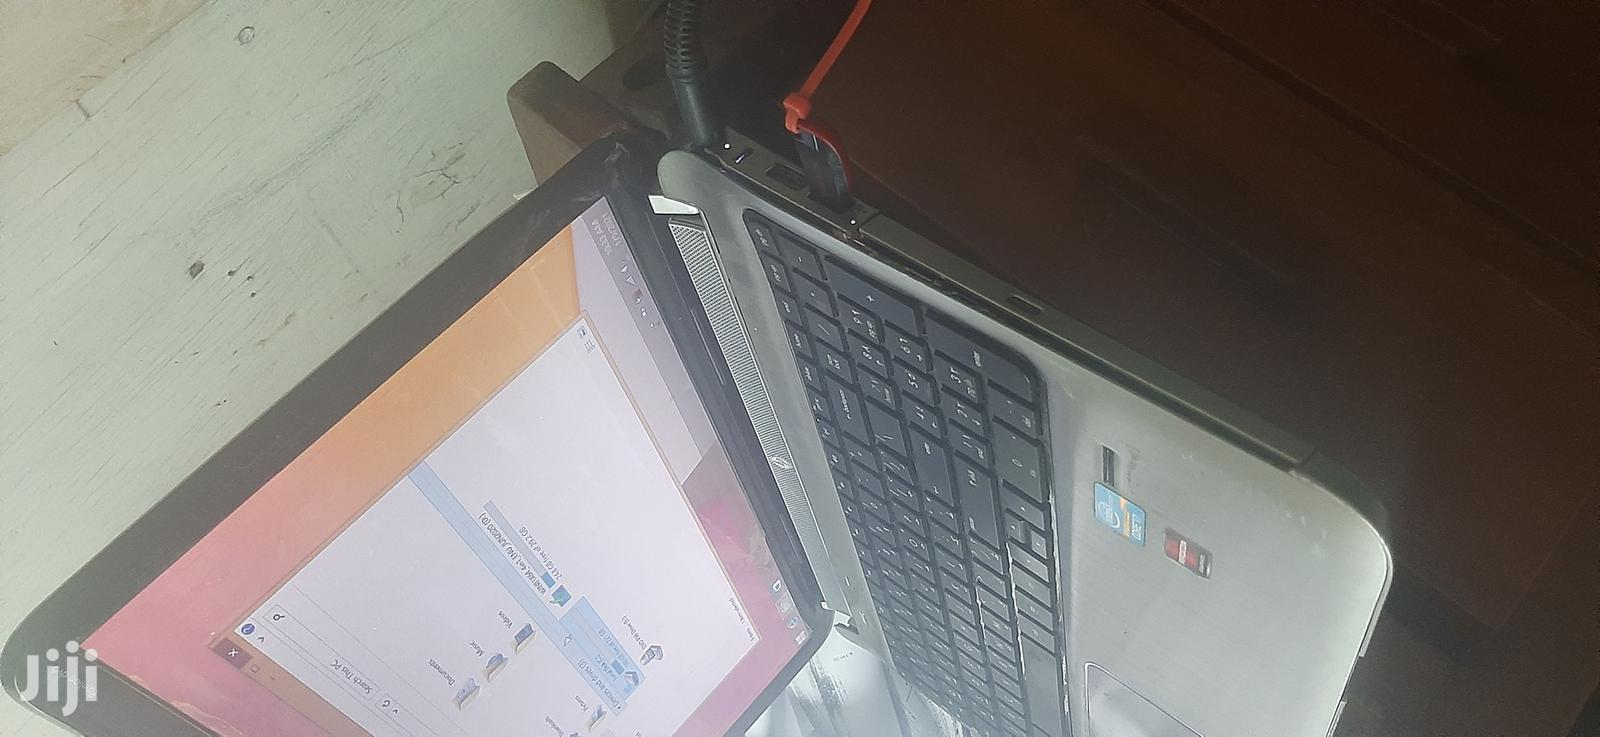 Laptop HP Pavilion Dv6 8GB Intel Core I7 SSD 256GB   Laptops & Computers for sale in Mombasa CBD, Mombasa, Kenya